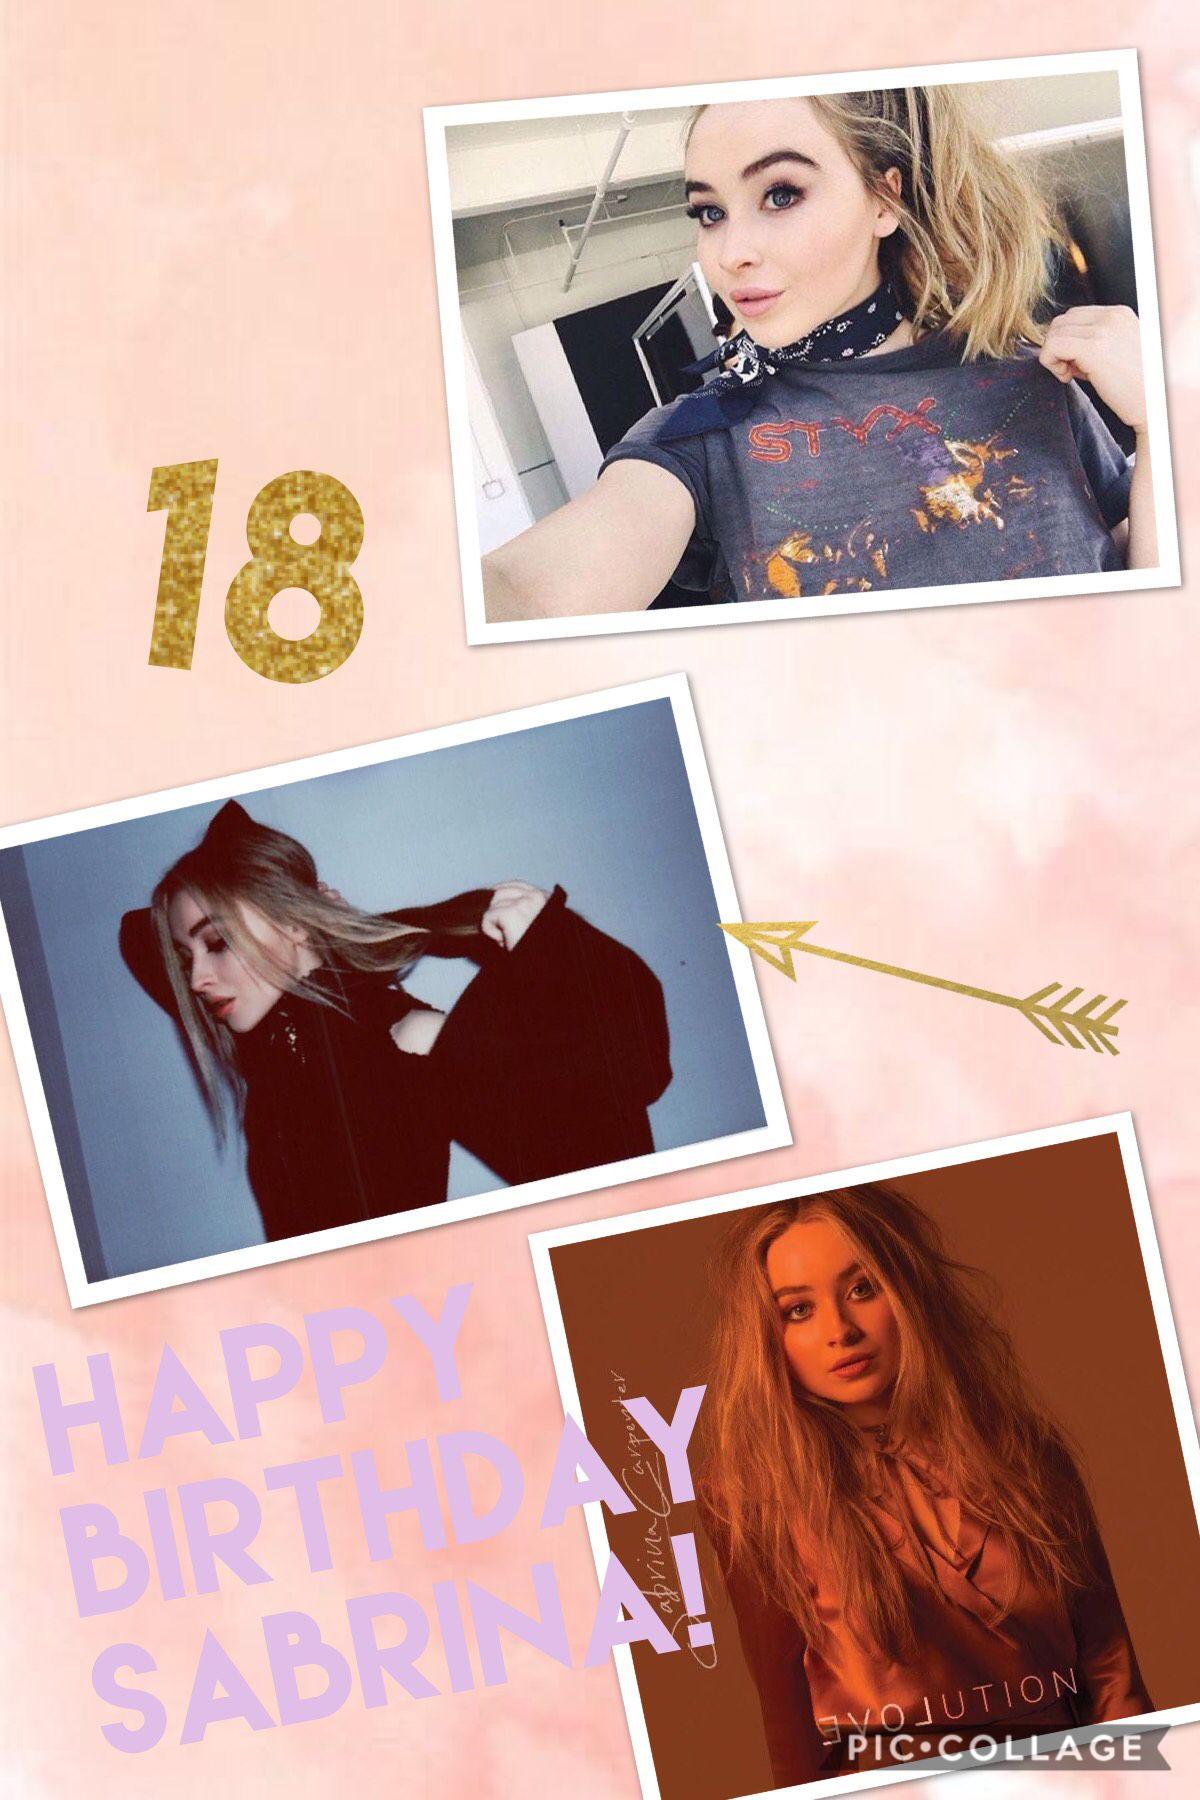 Happy 18 birthday sabby!